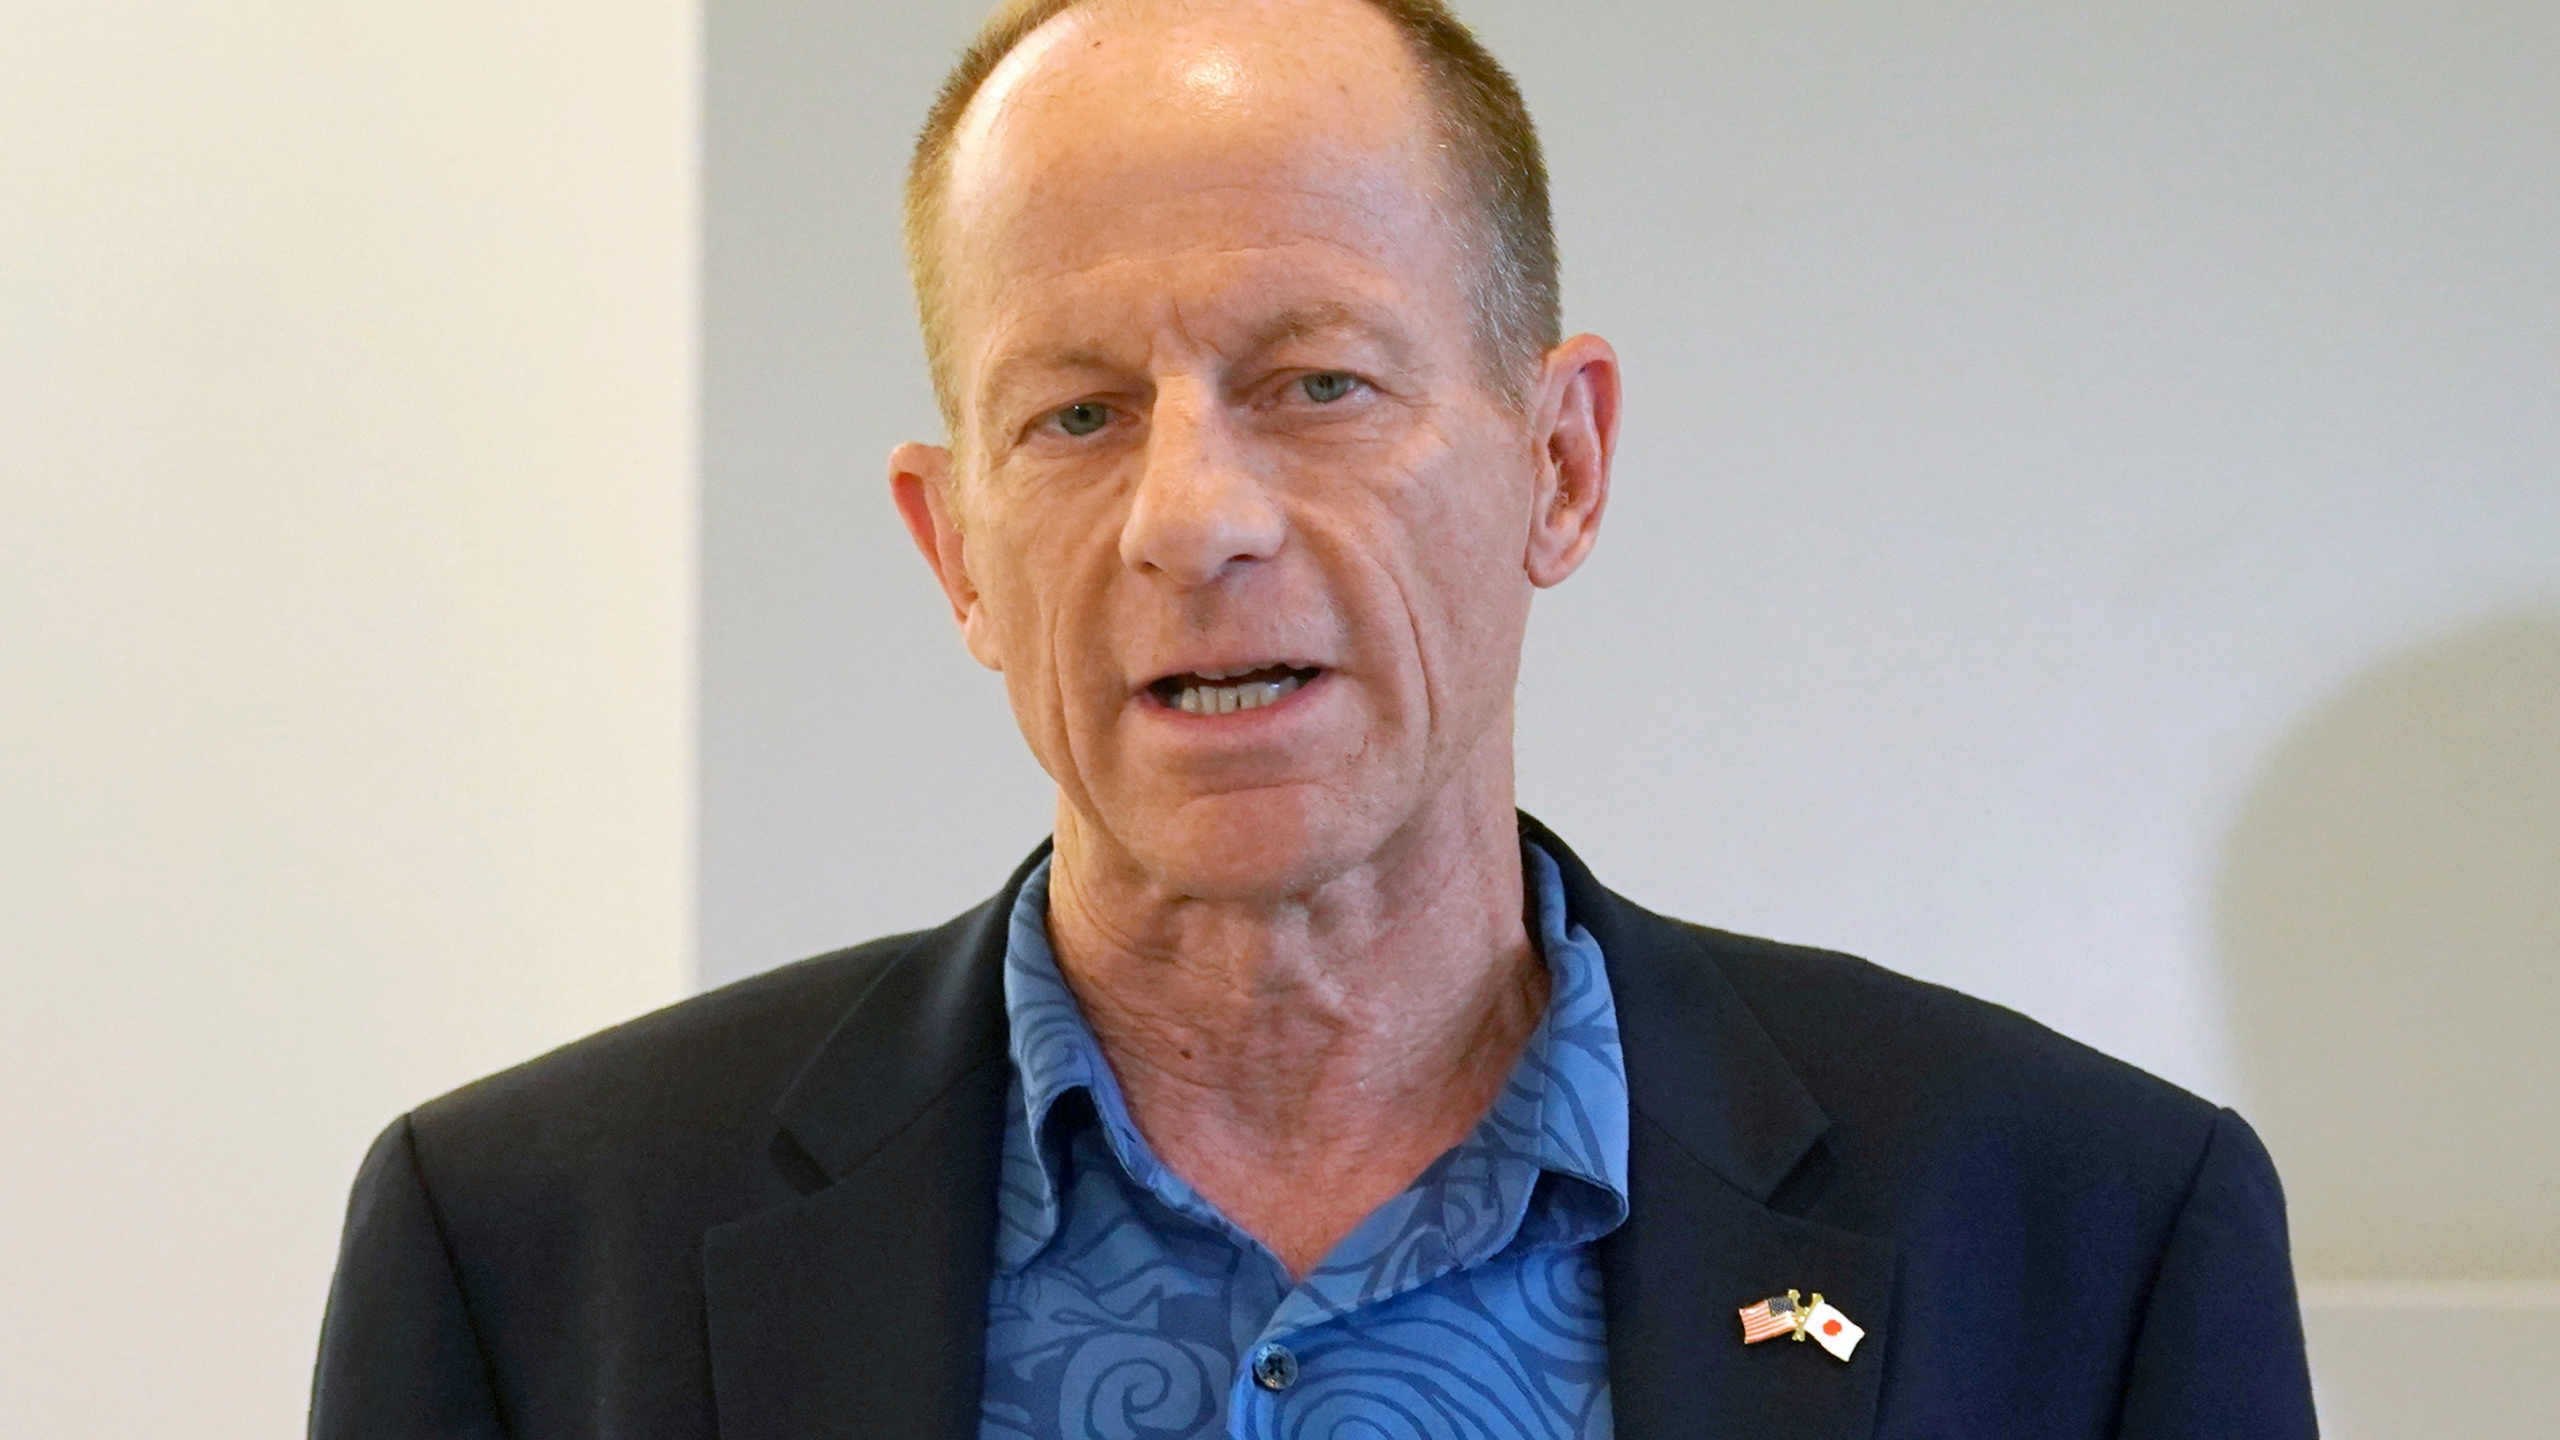 David Stilwell